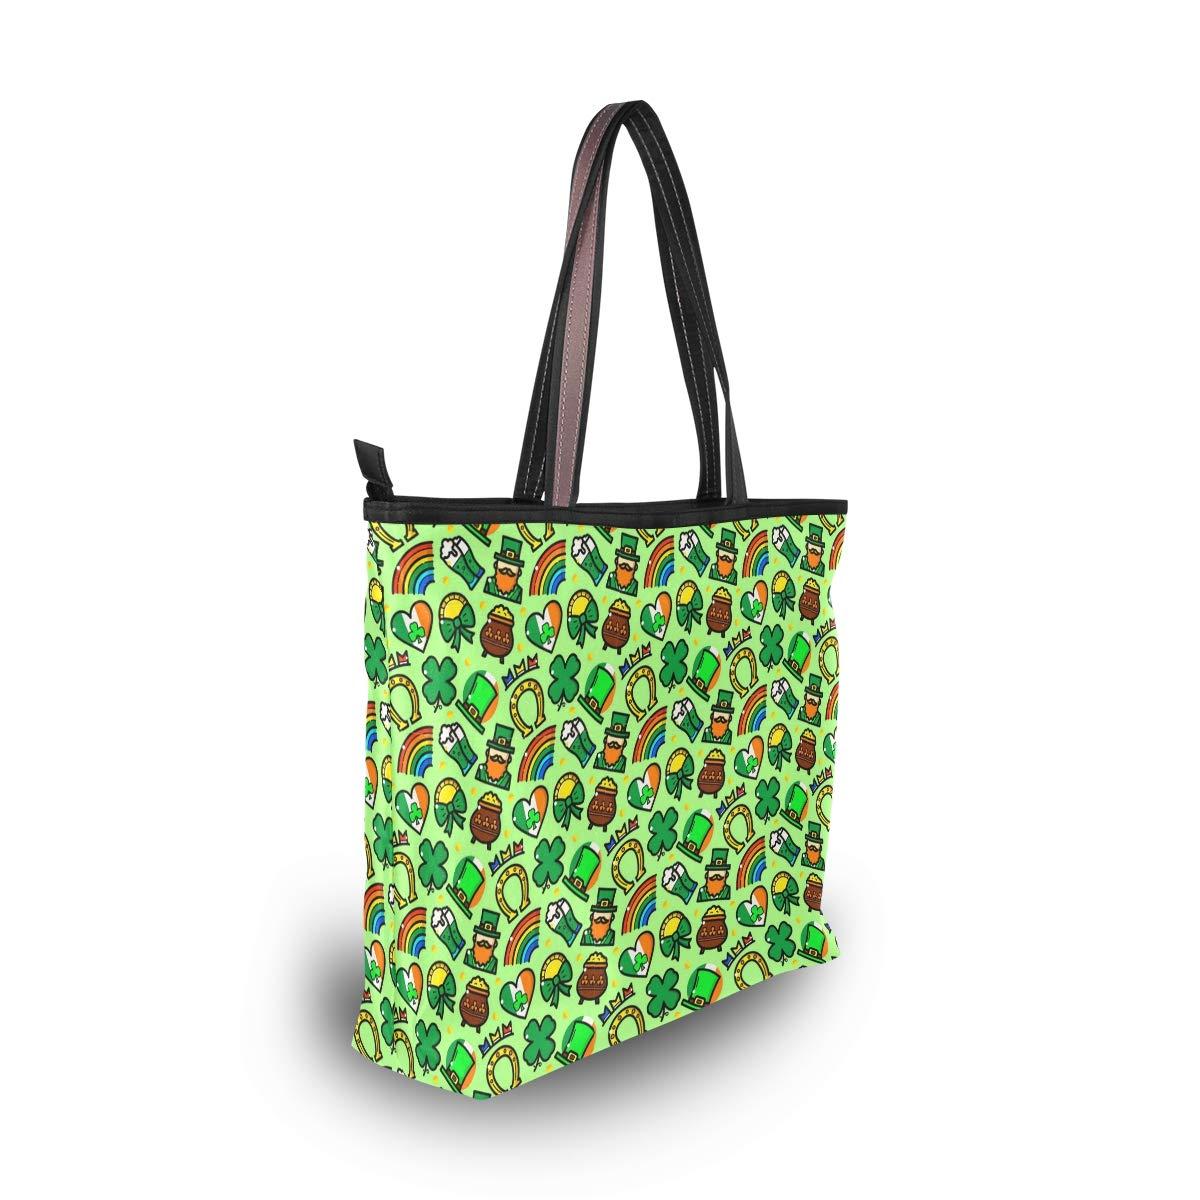 Women Handle Green St Patricks Day Satchel Handbags Tote Purse Shoulder Bag Big Capacity Handbag